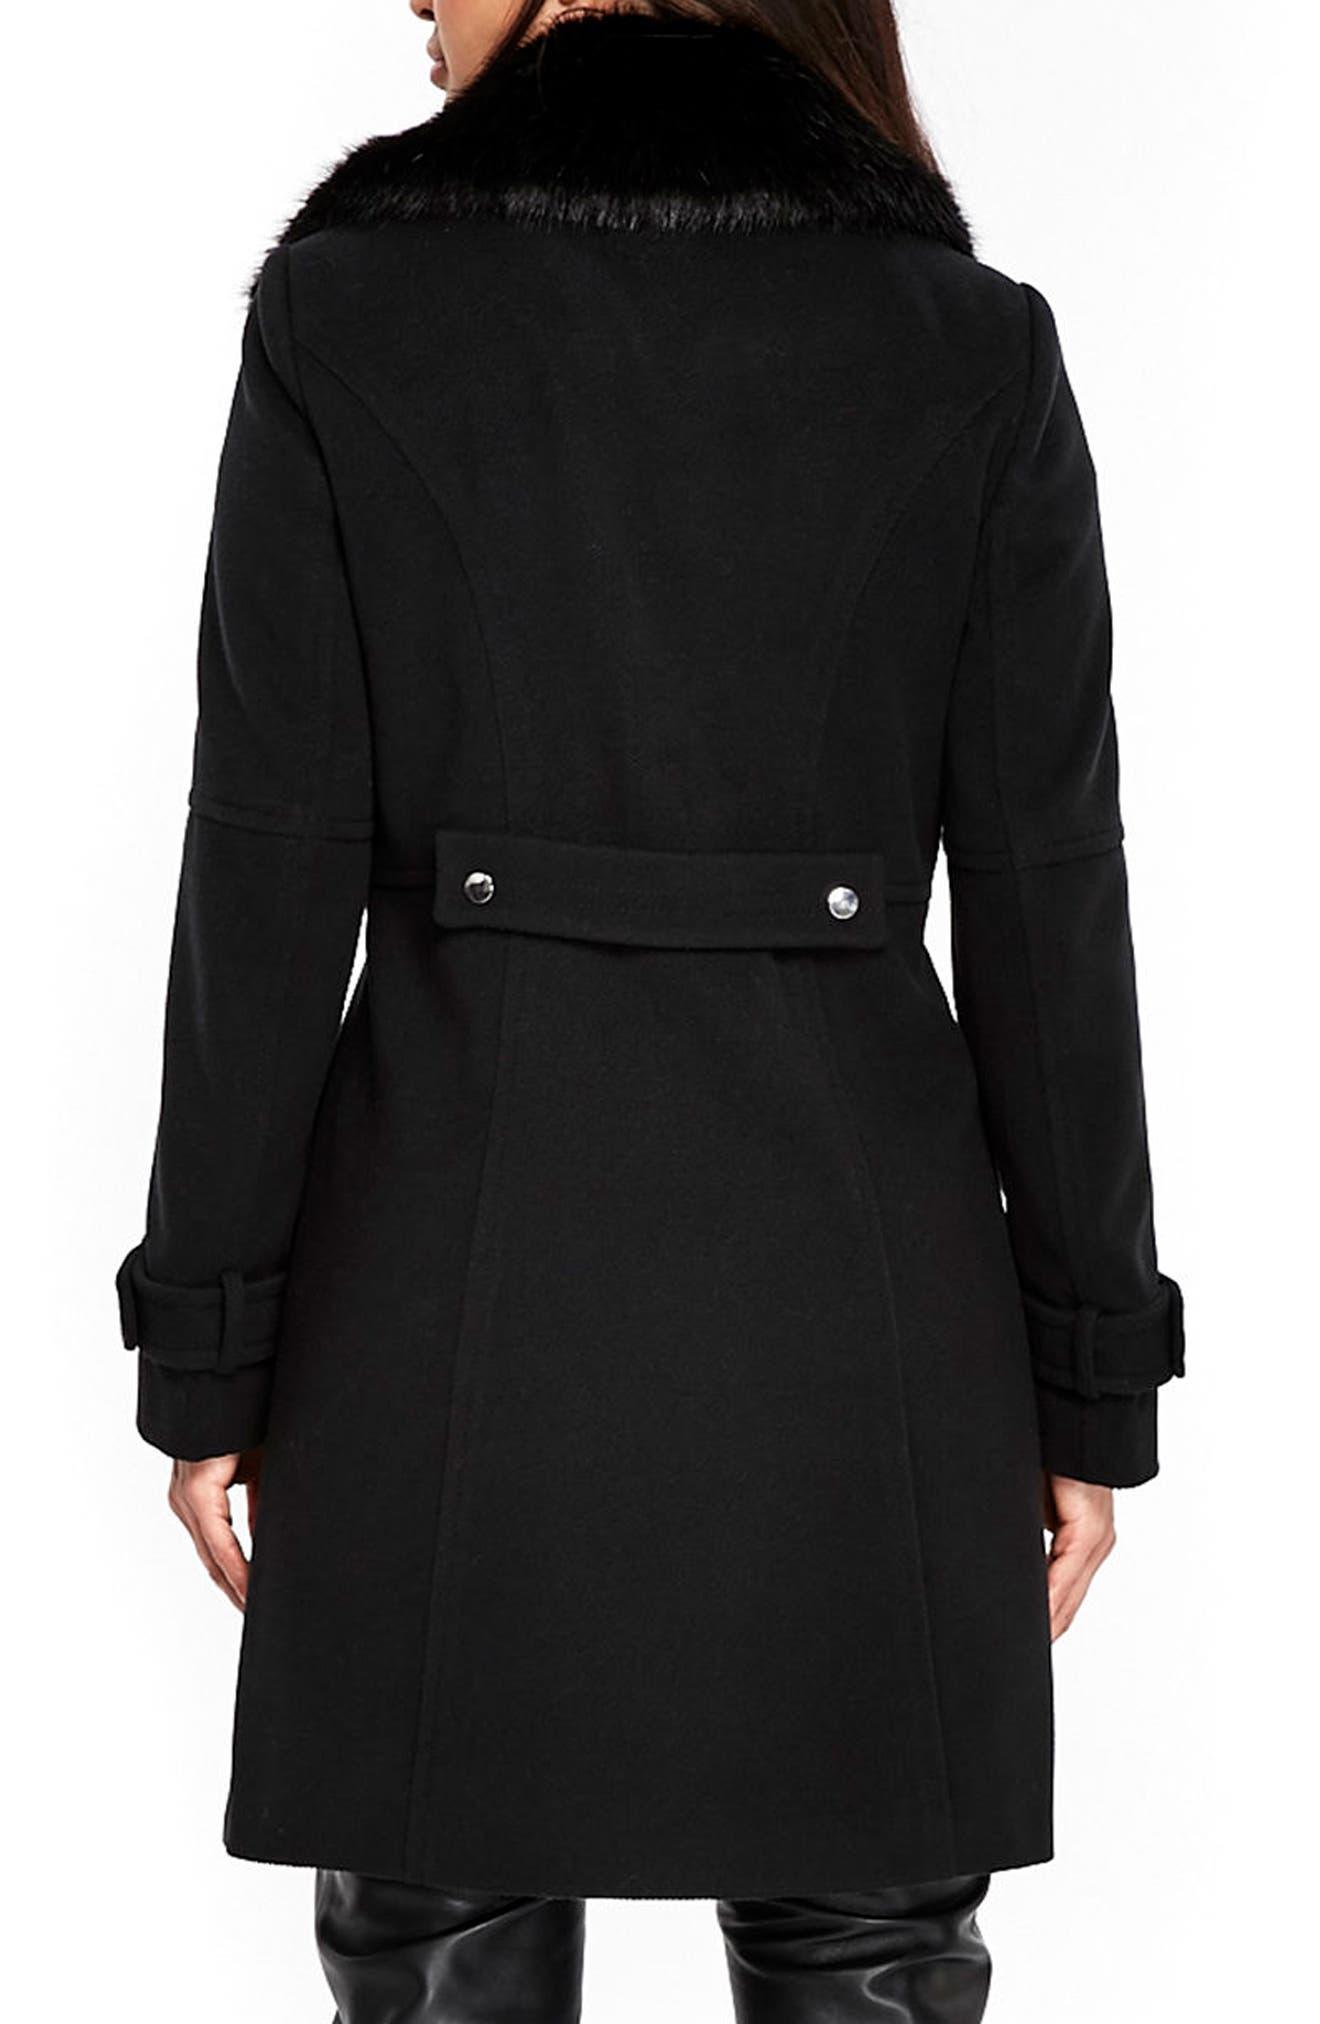 Twill Biker Jacket with Faux Fur Collar,                             Alternate thumbnail 2, color,                             Black